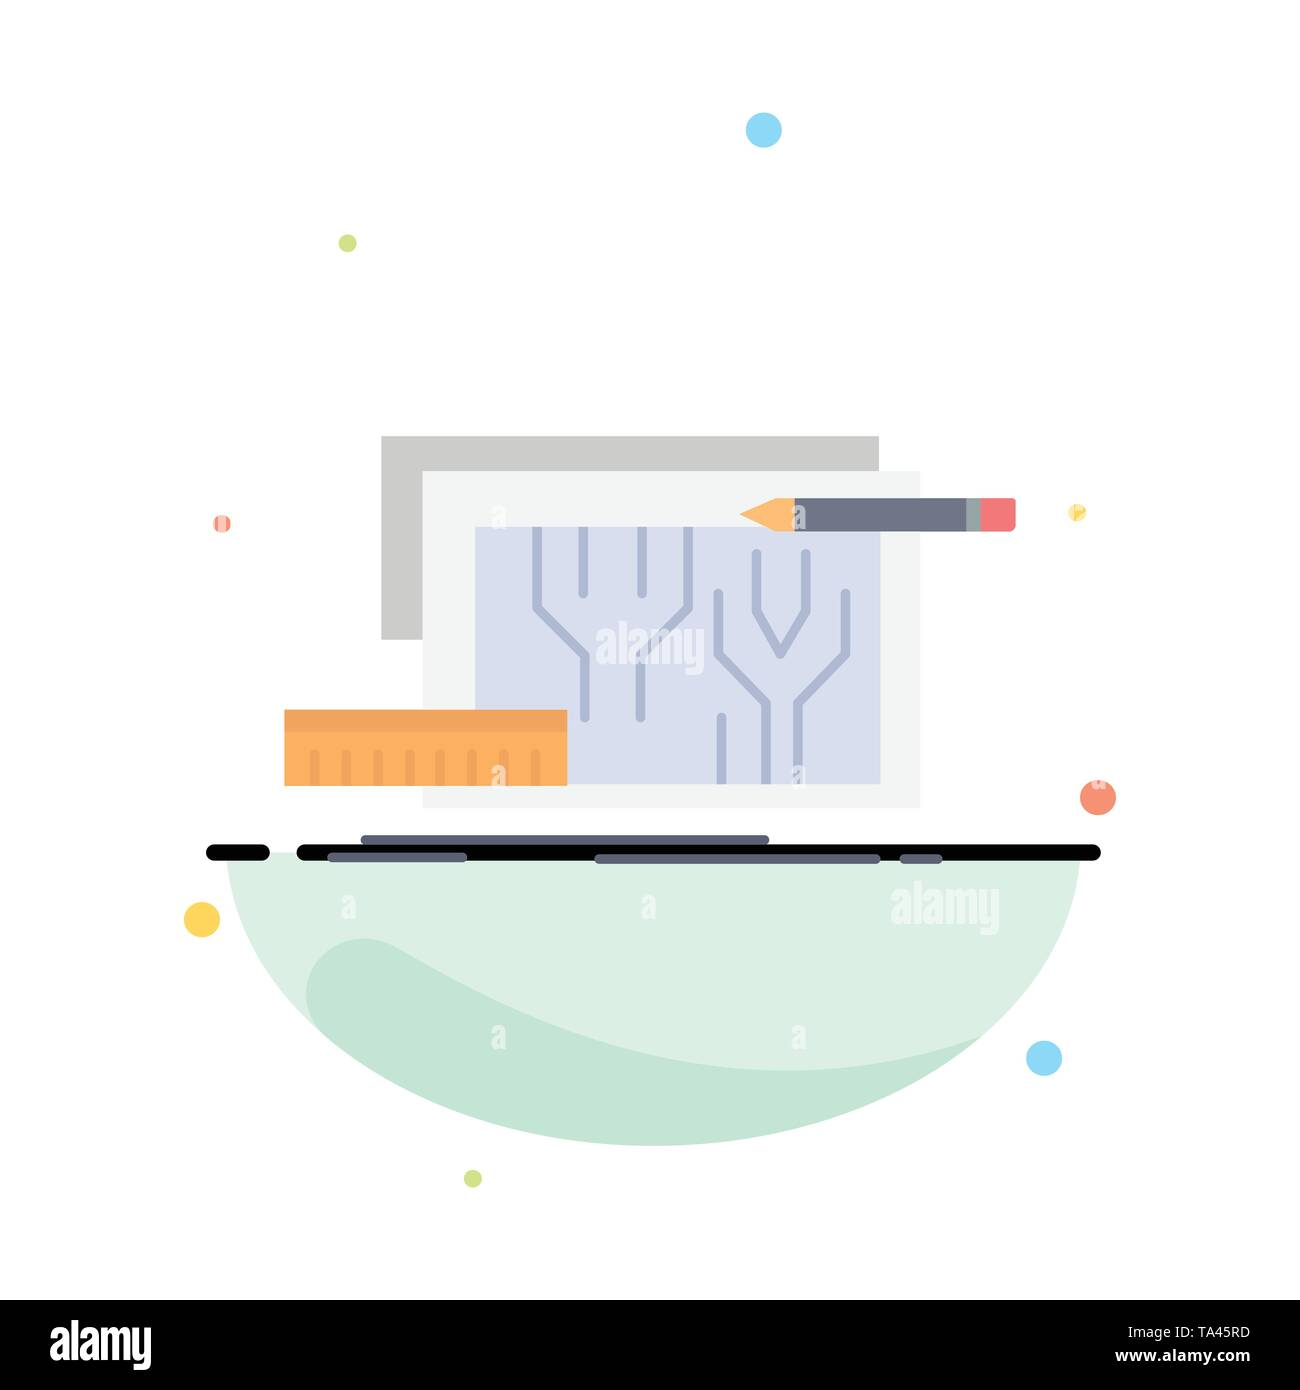 Architektur, Blaupause, Stromkreis, Design, Engineering flachen Farbe Symbol Vektor Stockbild